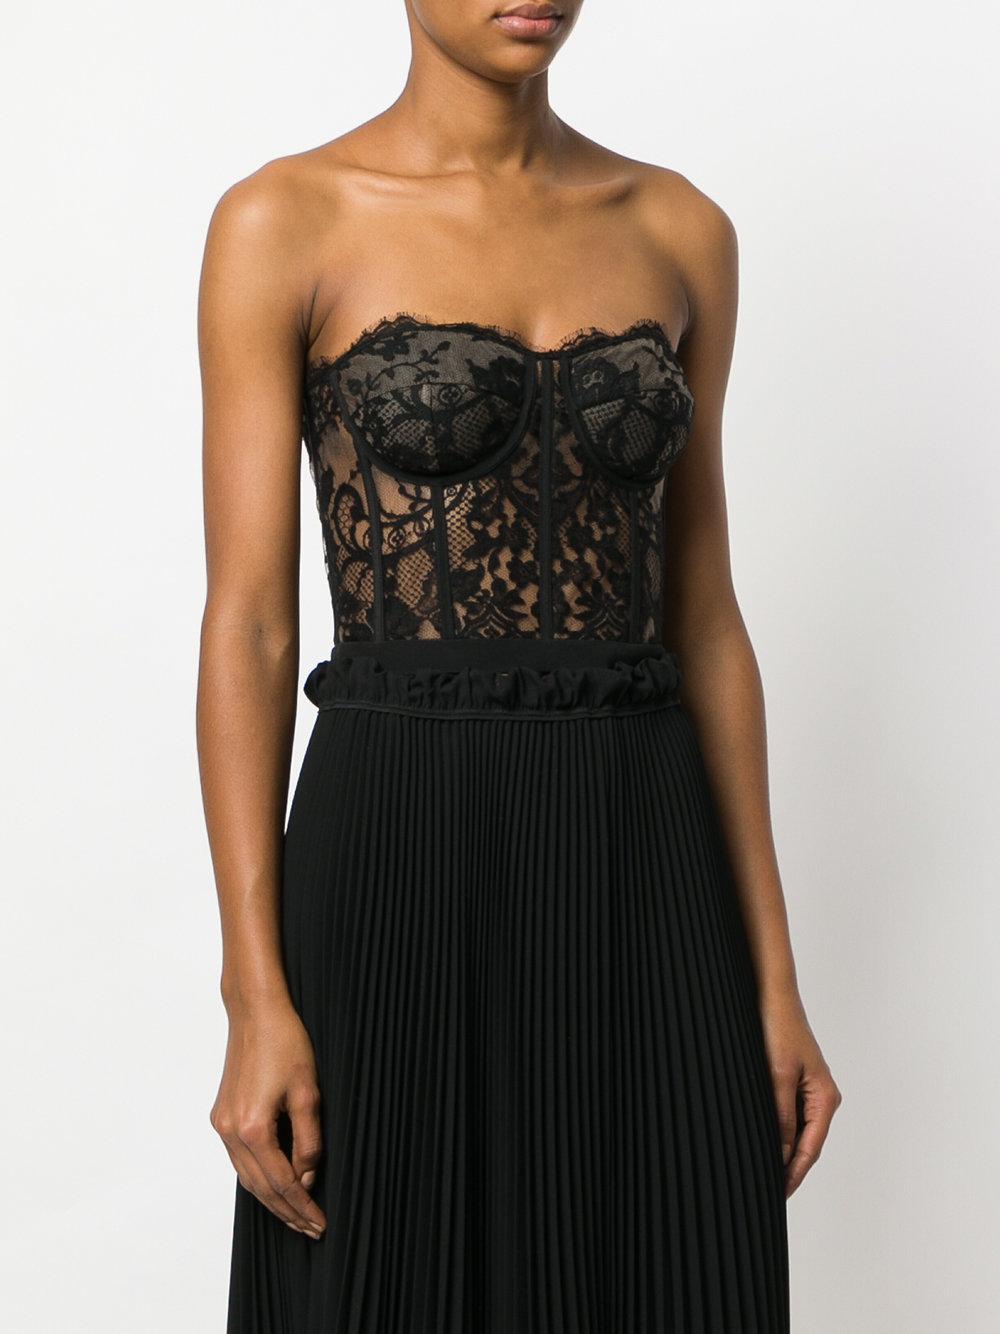 Lyst - Alexander McQueen Lace Bustier Top in Black ab5e4b707